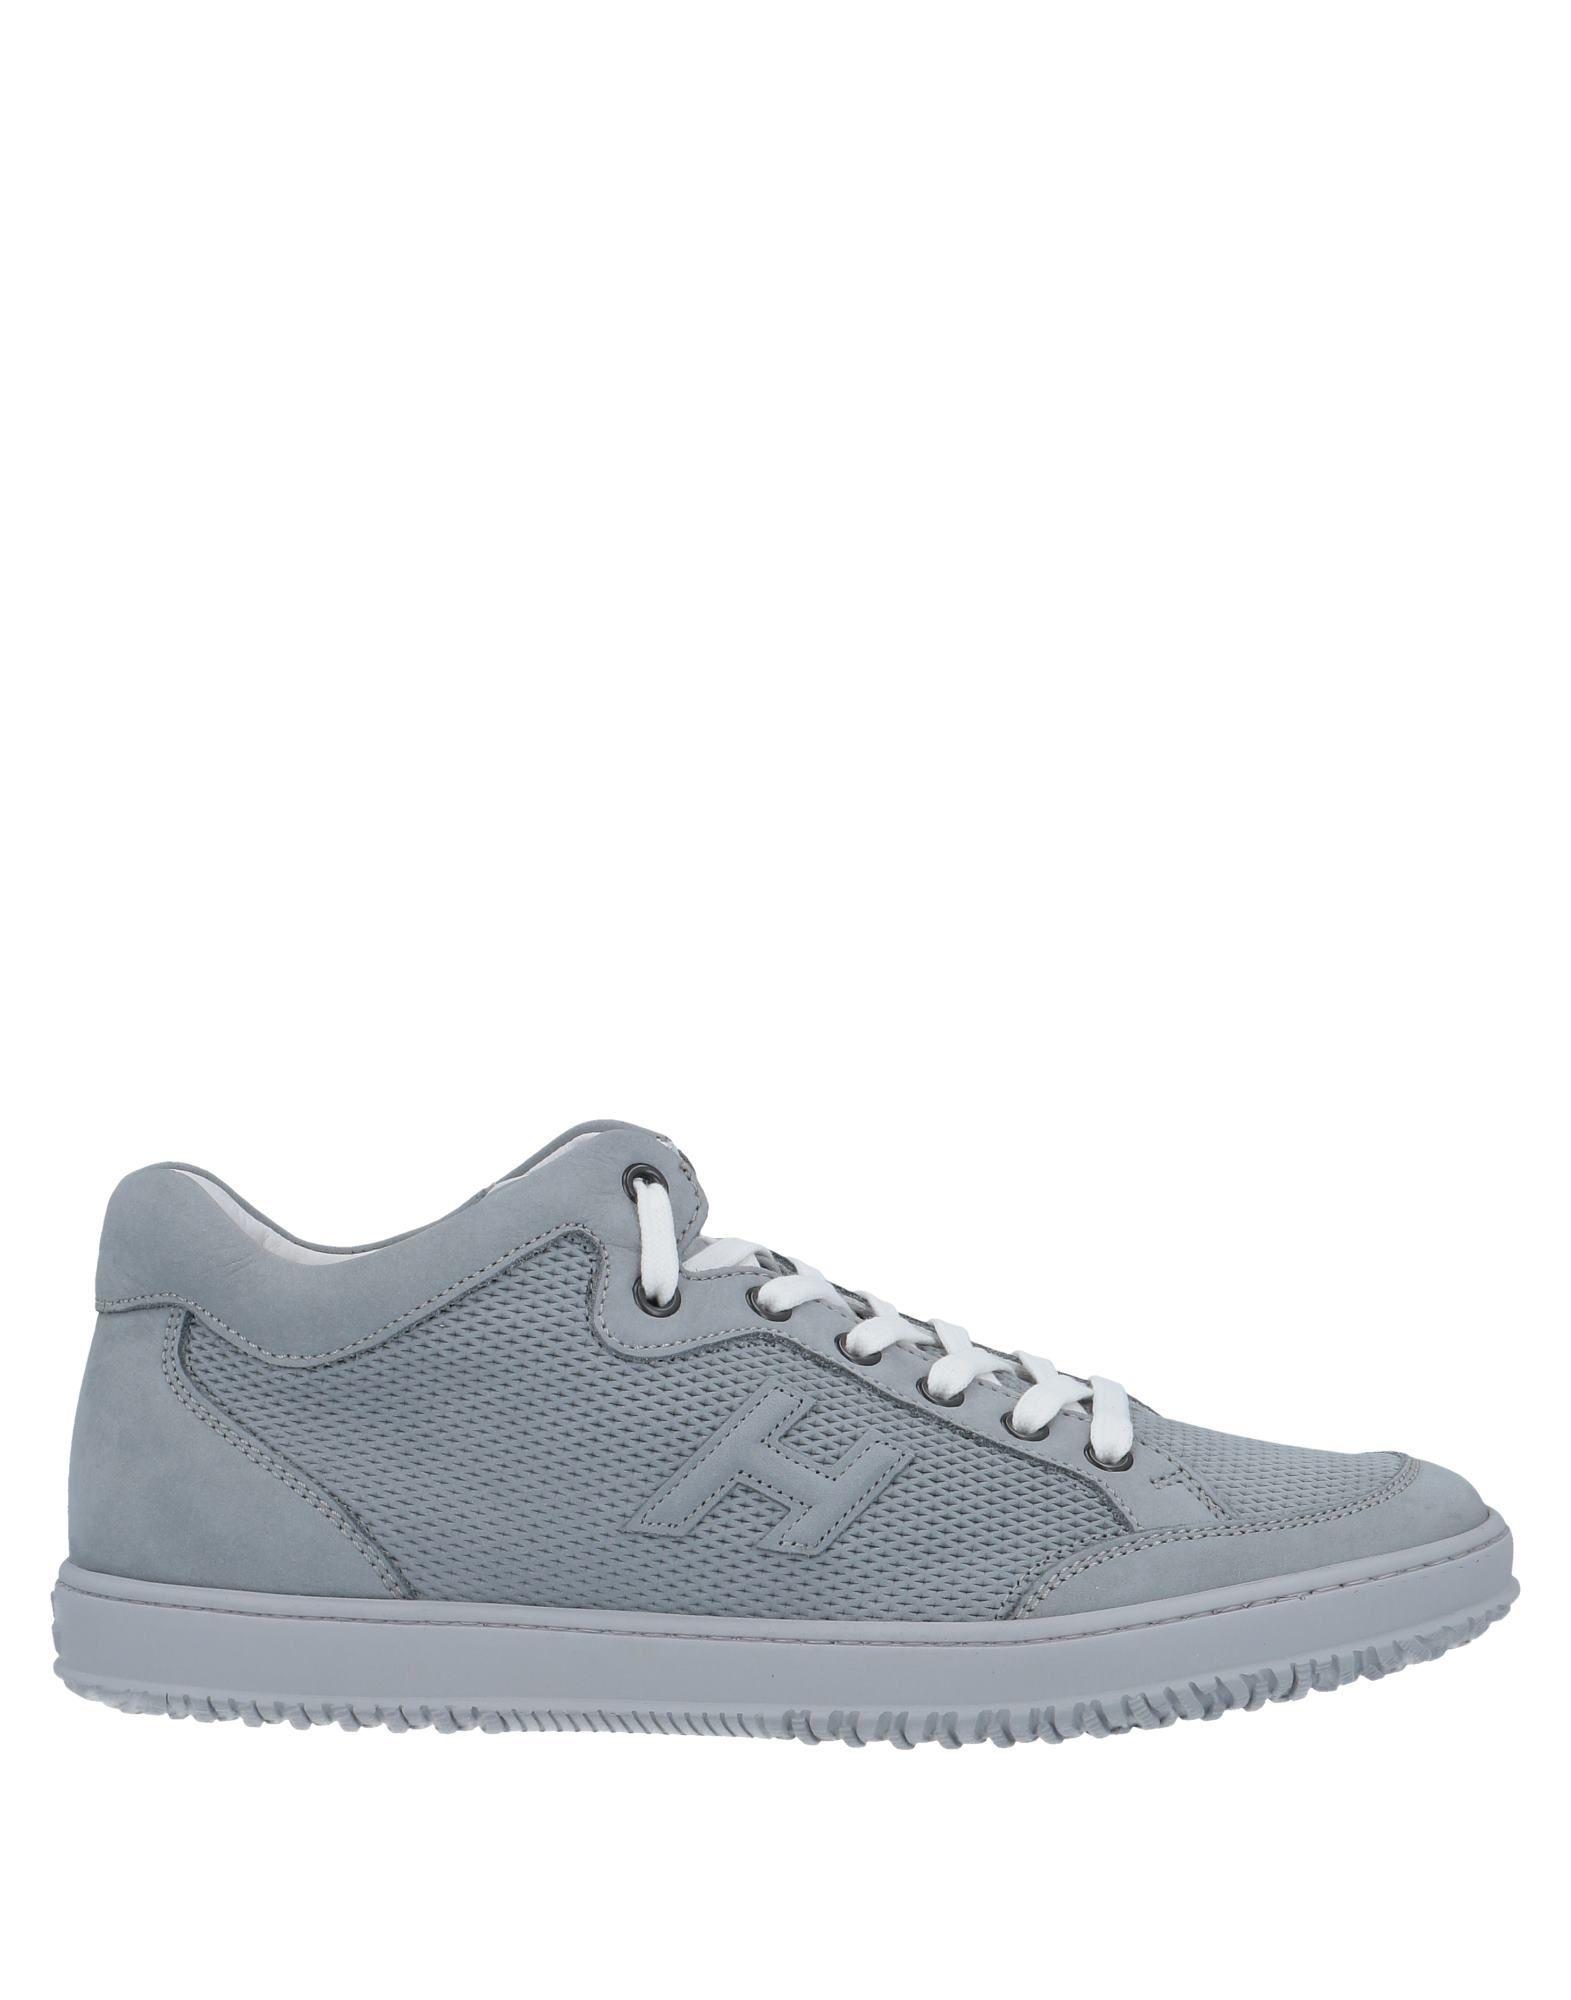 Hogan Uomo Sneakers & Tennis shoes basse Grigio Taglia 39.5 Pelle ...